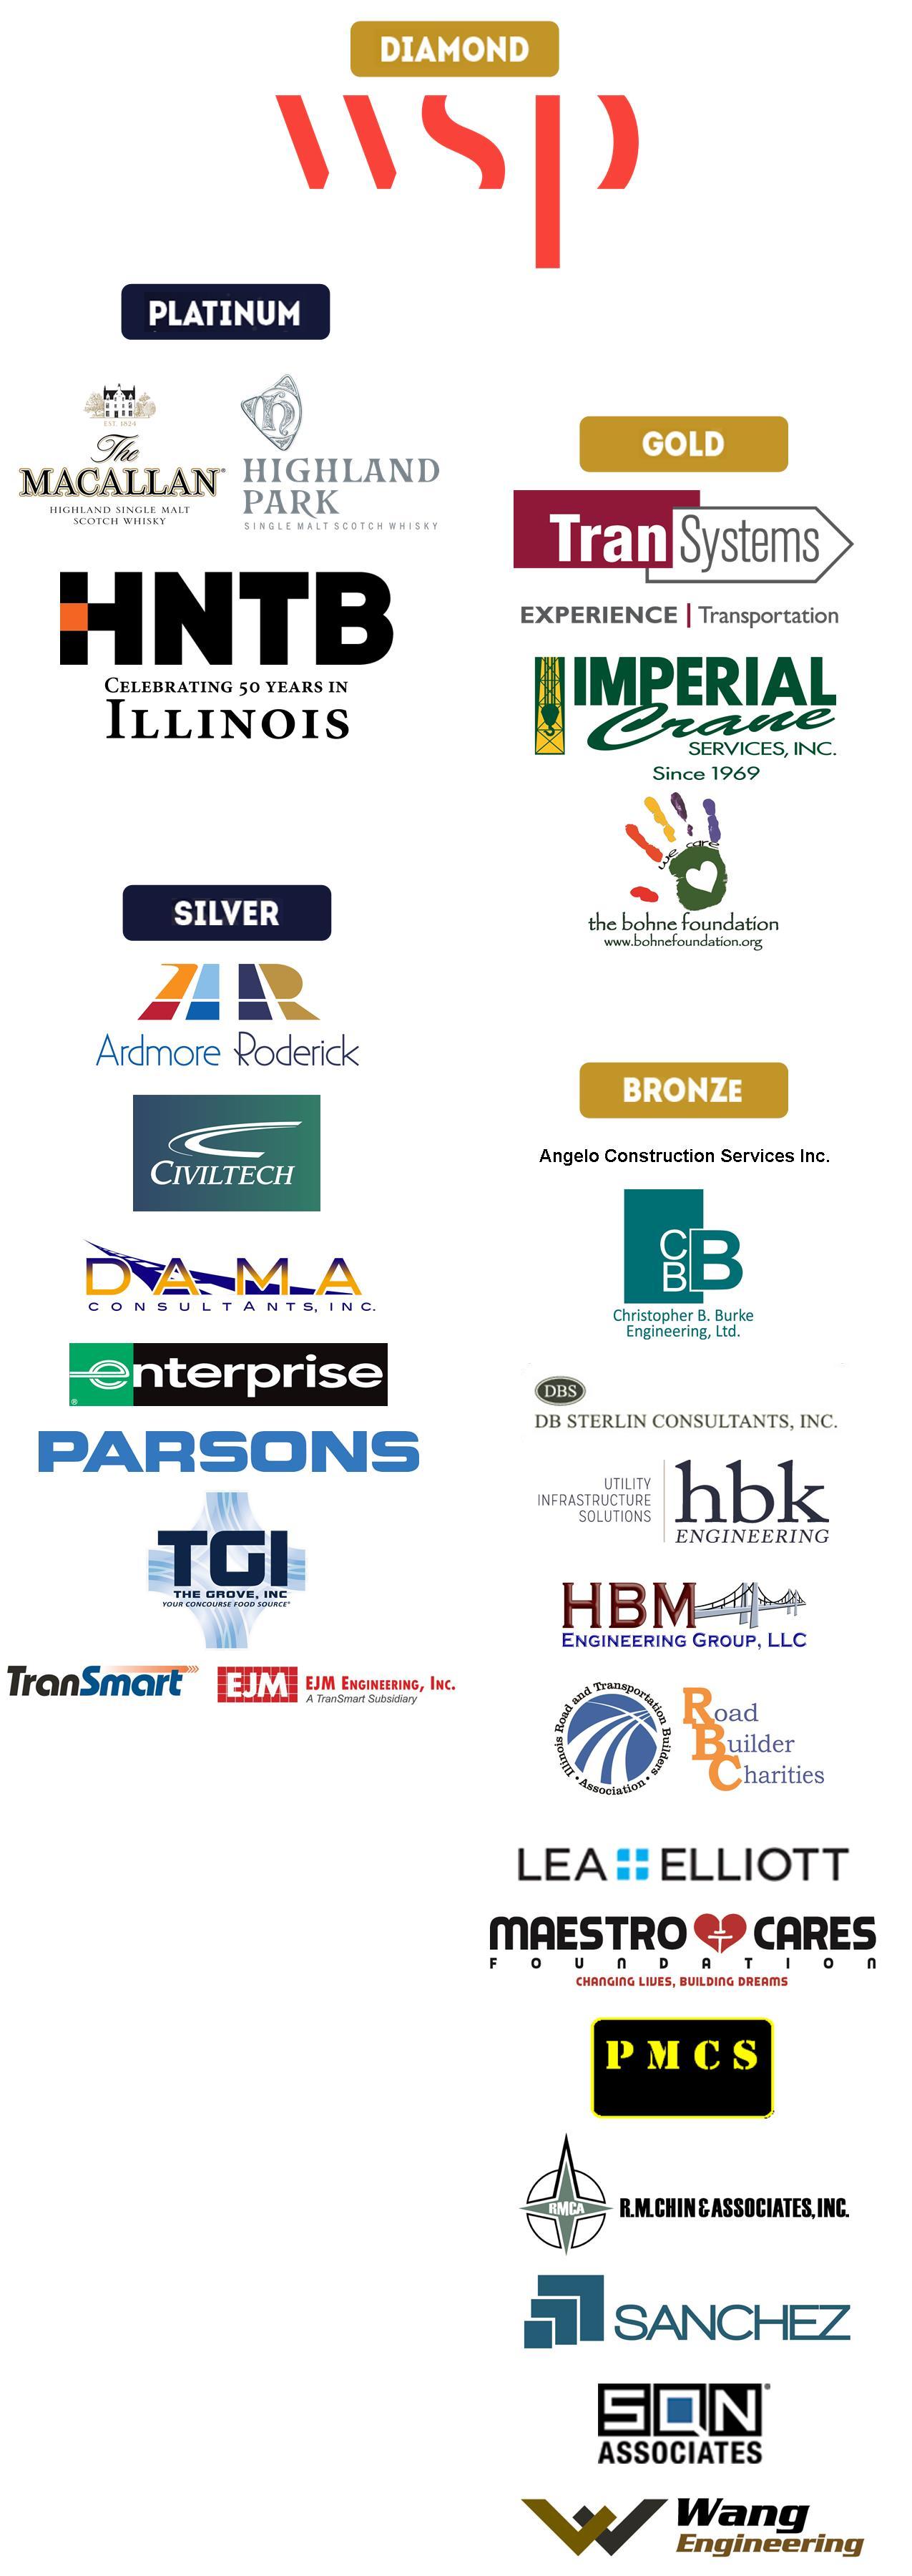 old 2017 Sponsor Logos (2)